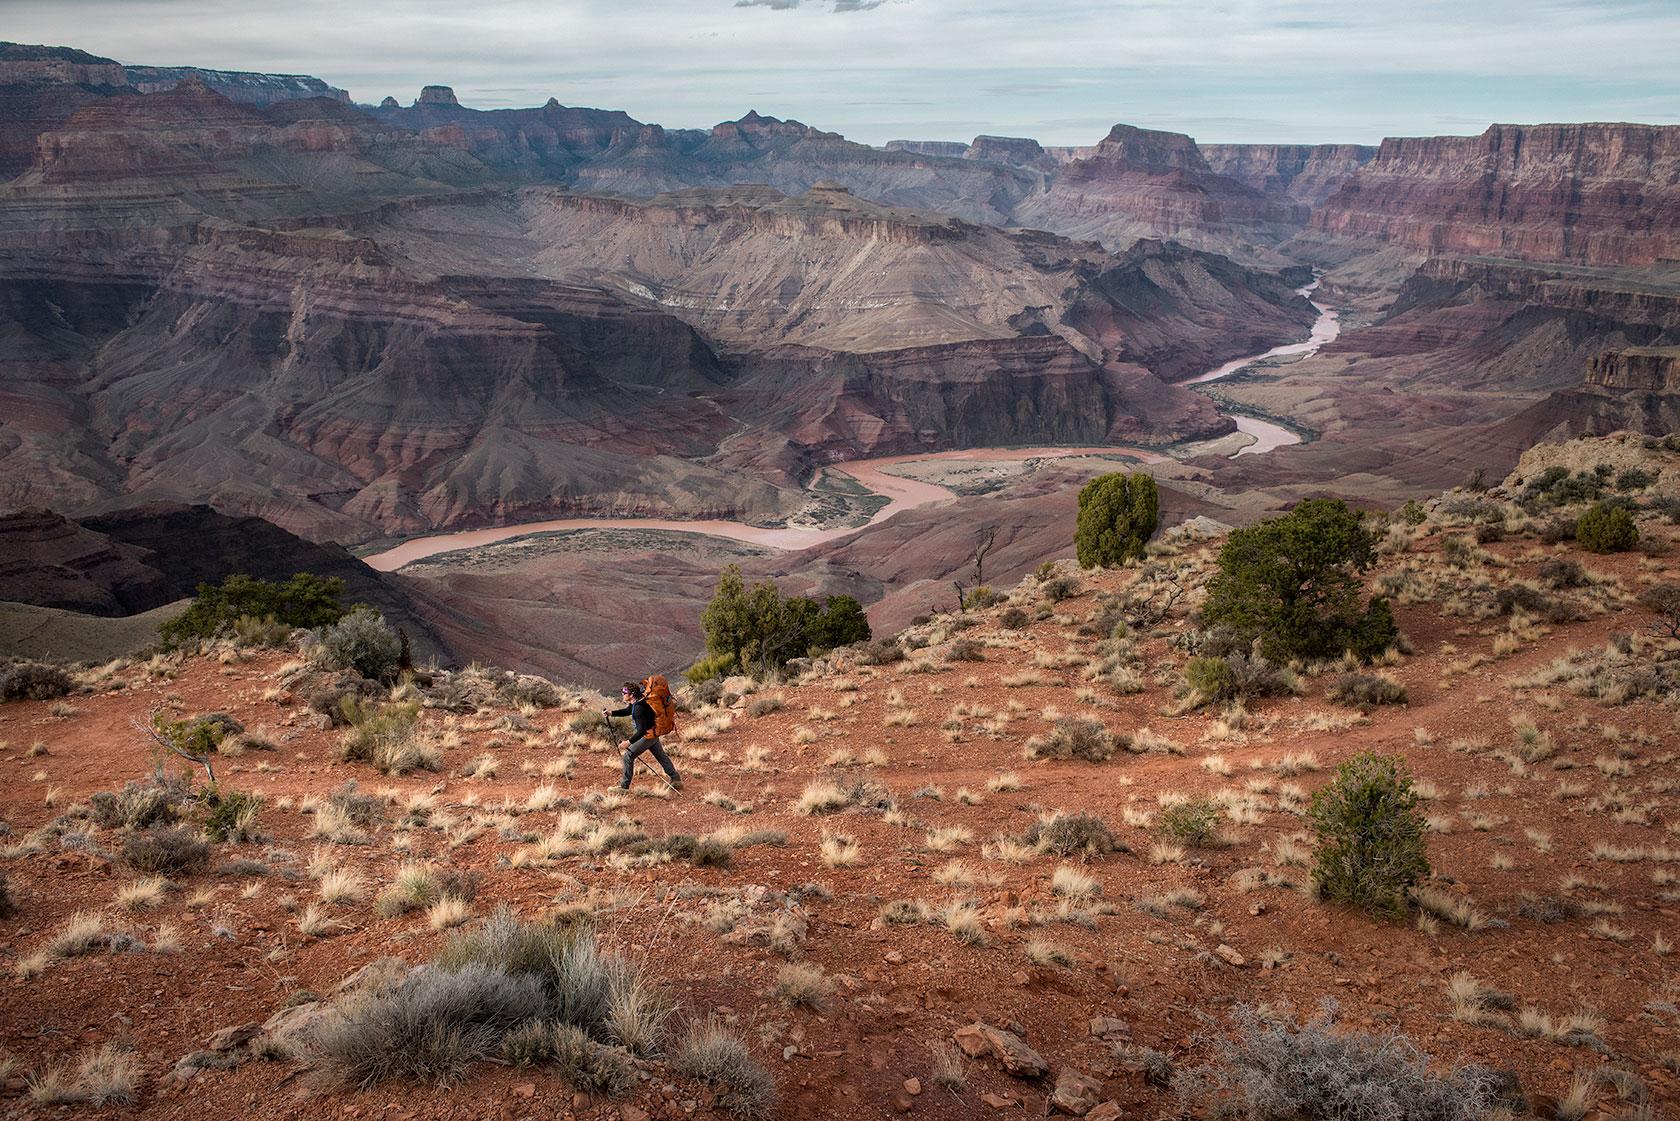 austin-trigg-osprey-hiking-backpacks-grand-canyon-osprey-pack-hike-camp-desert-arizona.jpg